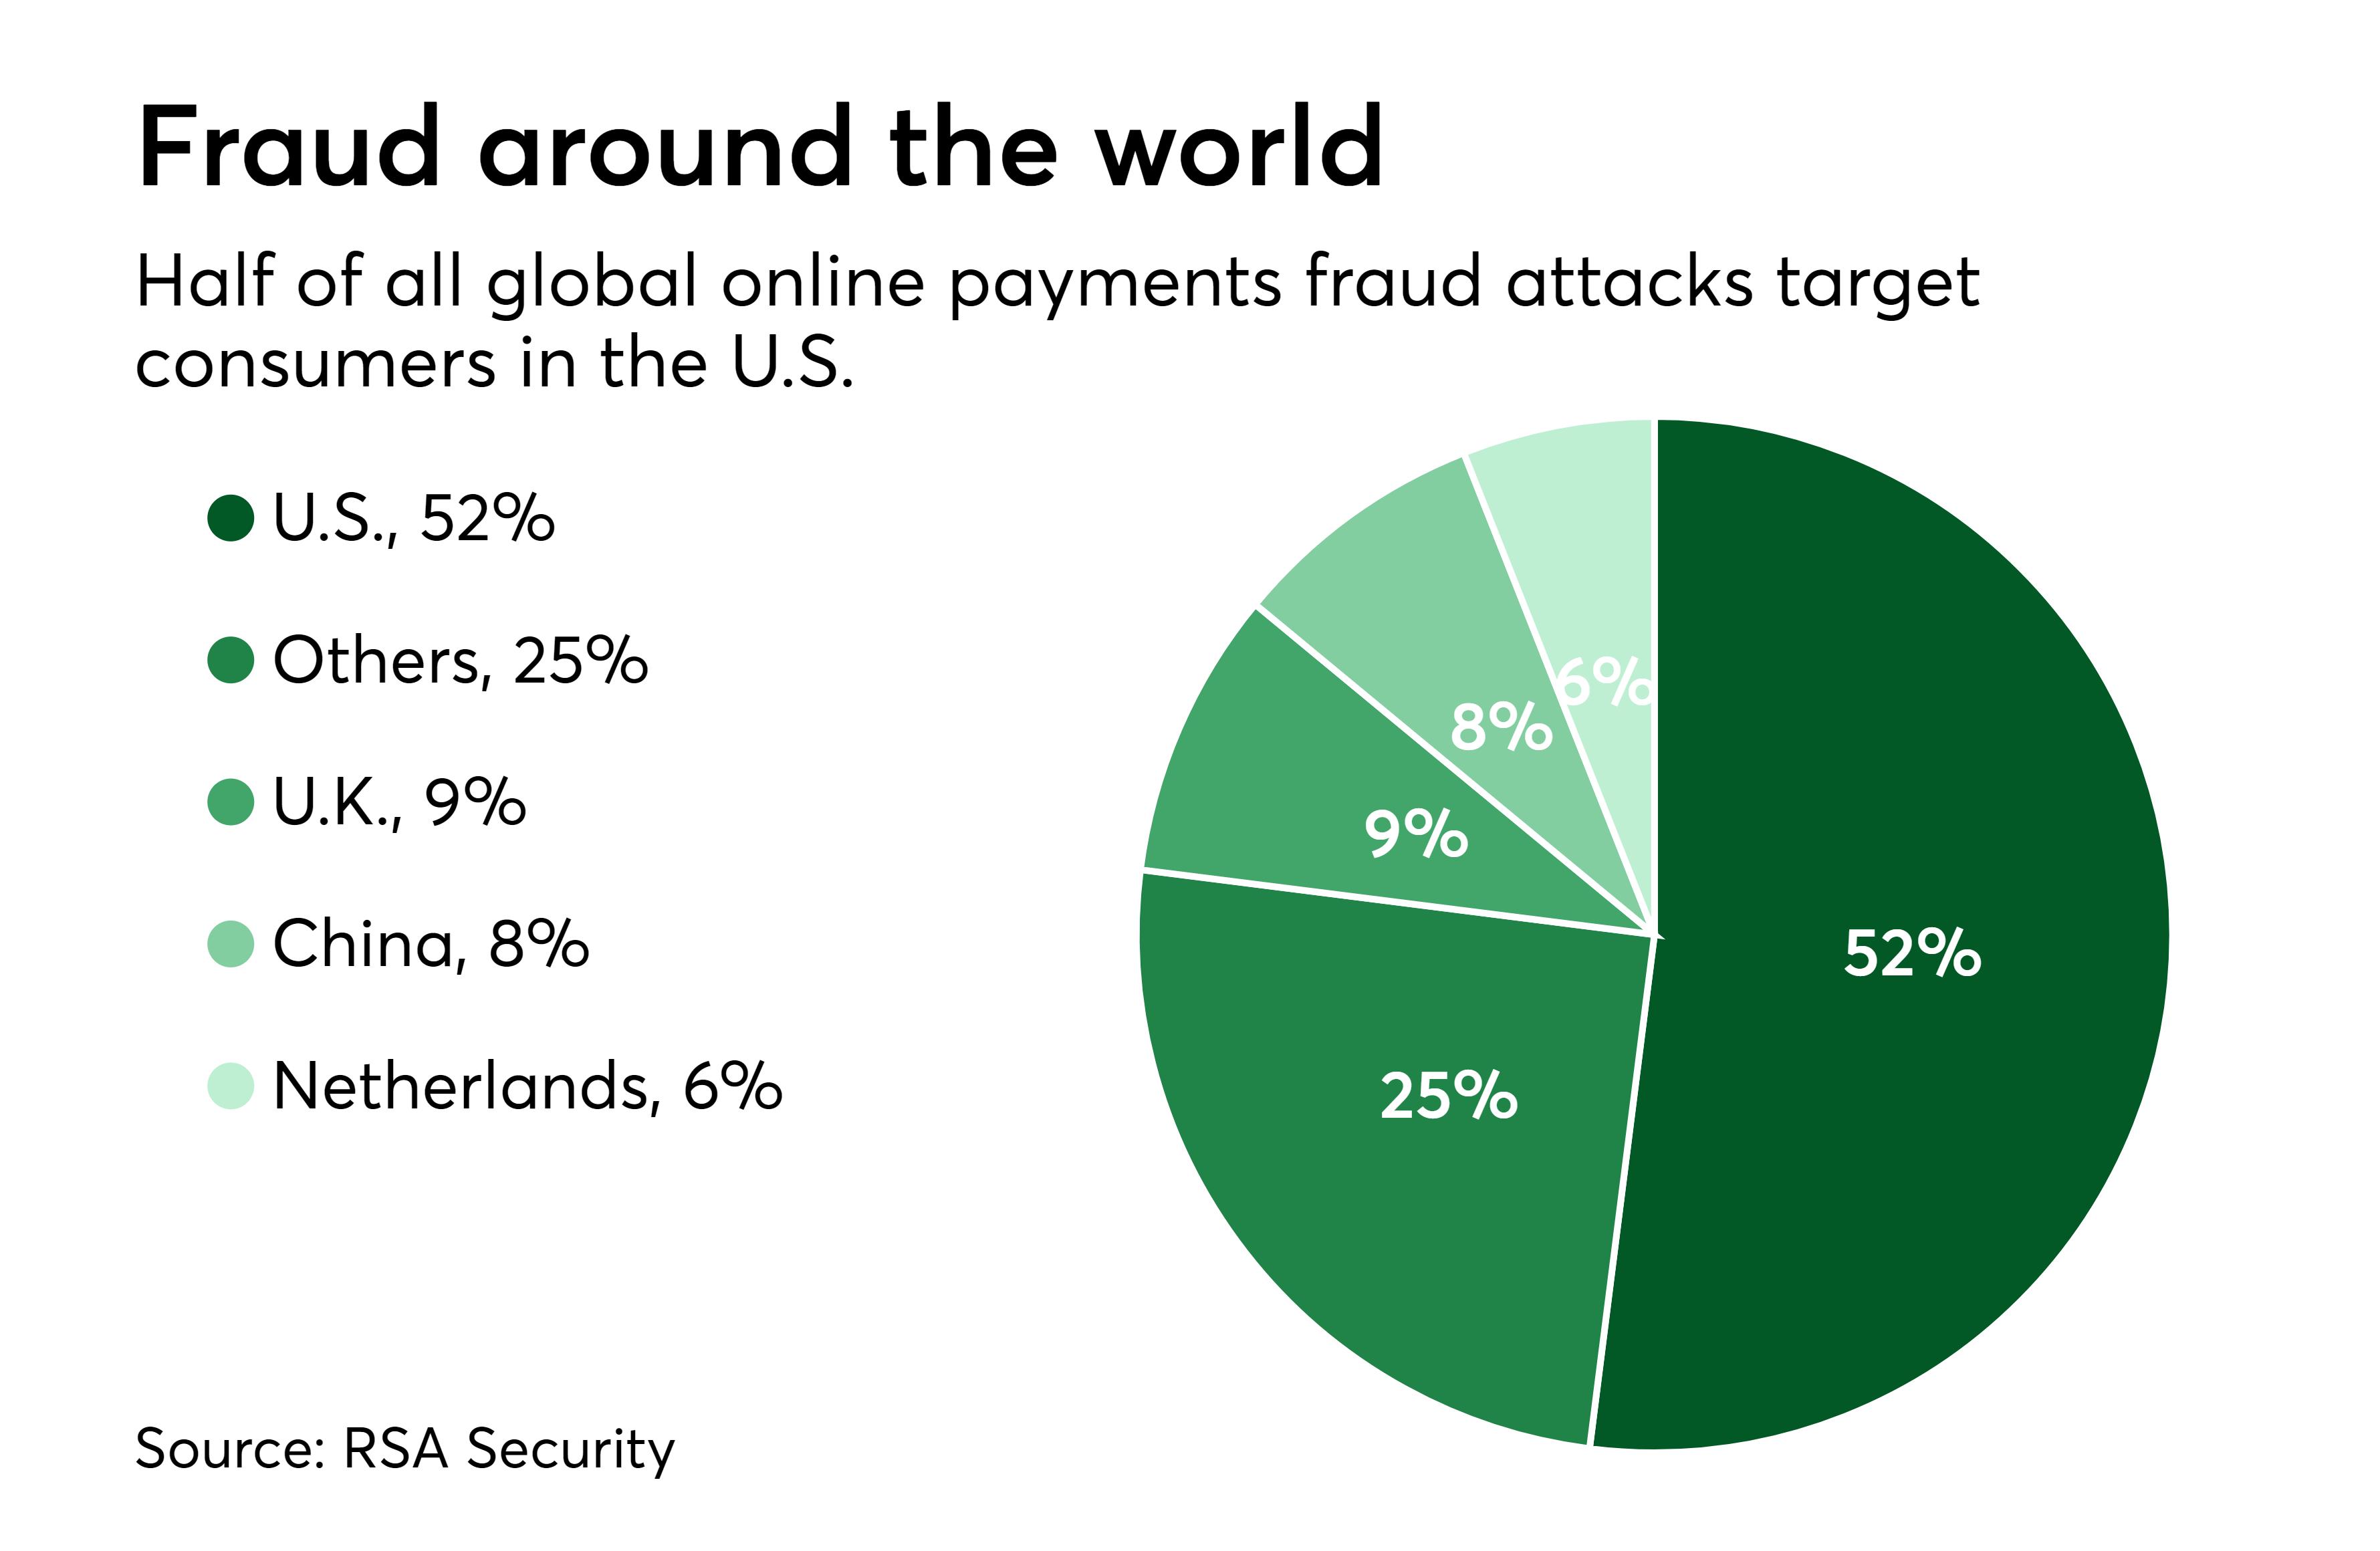 Fraud around the world